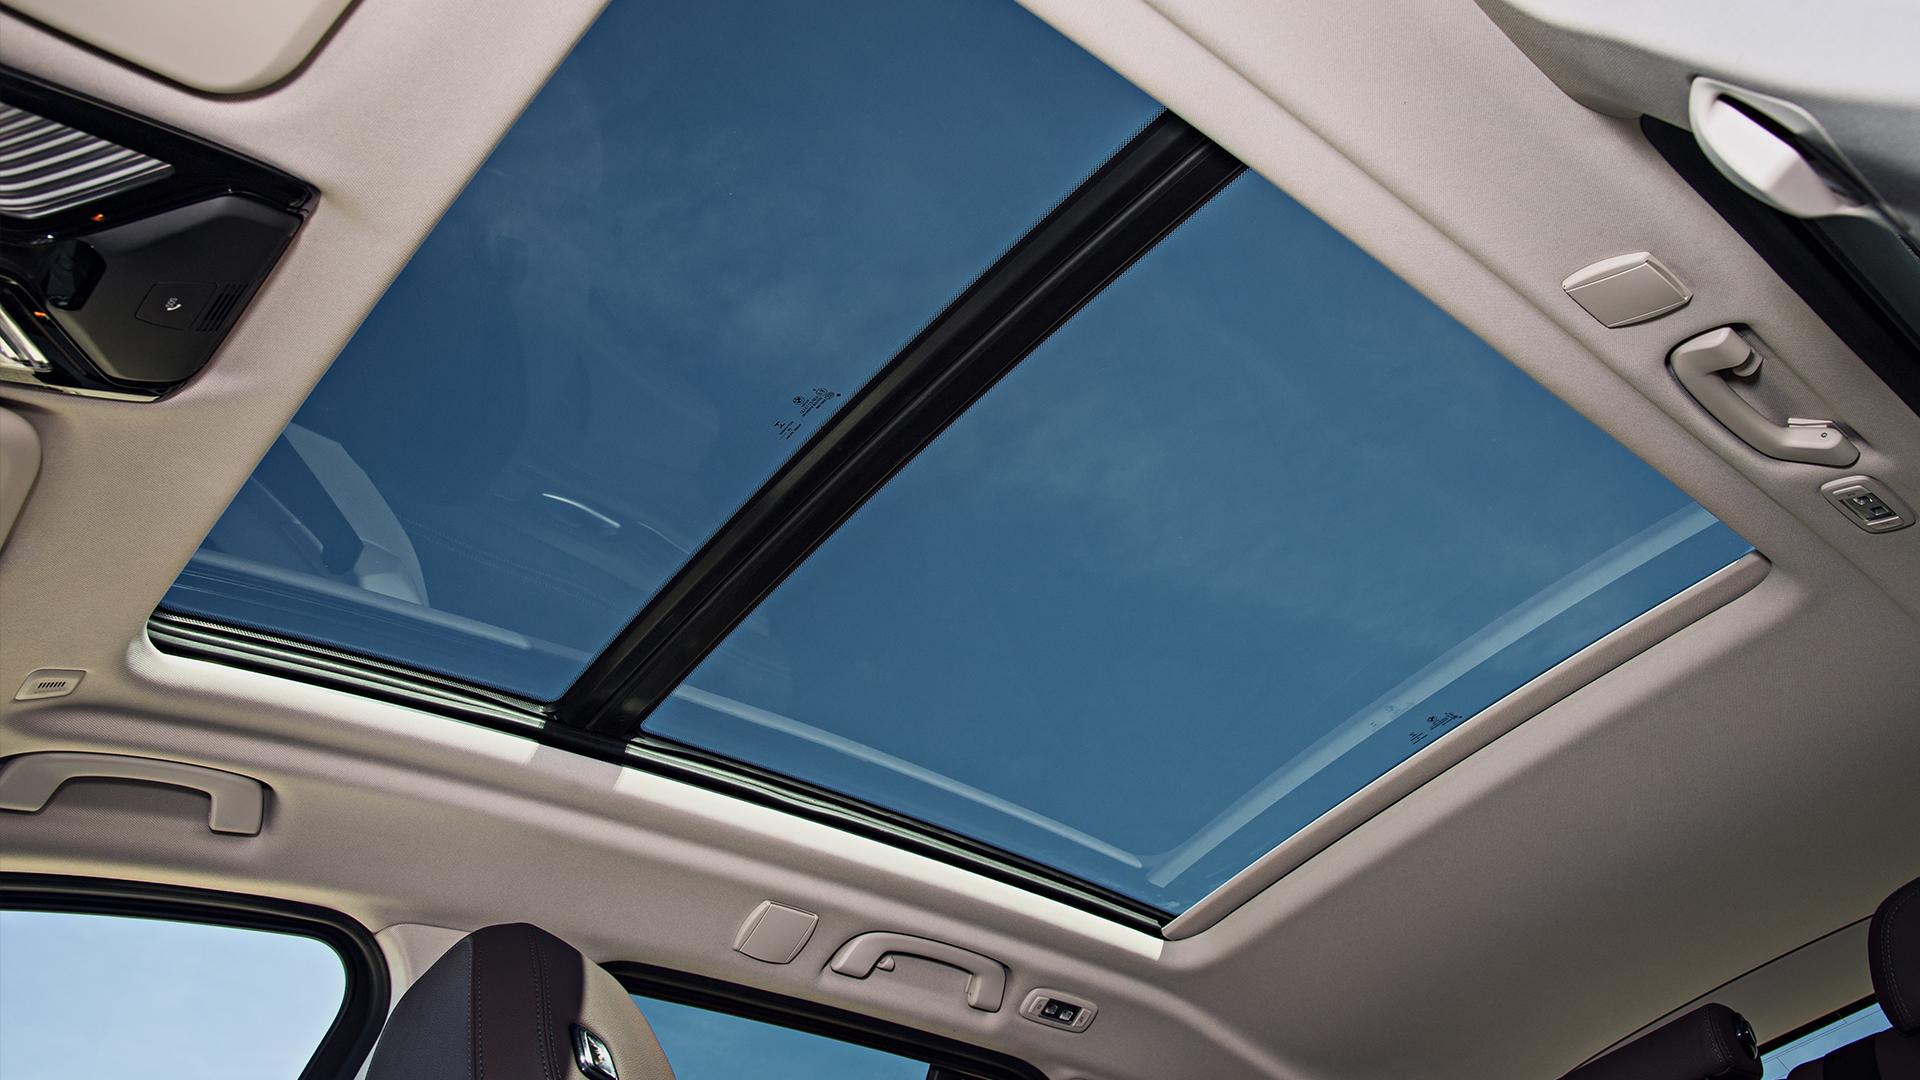 BMW X3 2018 XDrive20d Interior Car Photos - Overdrive